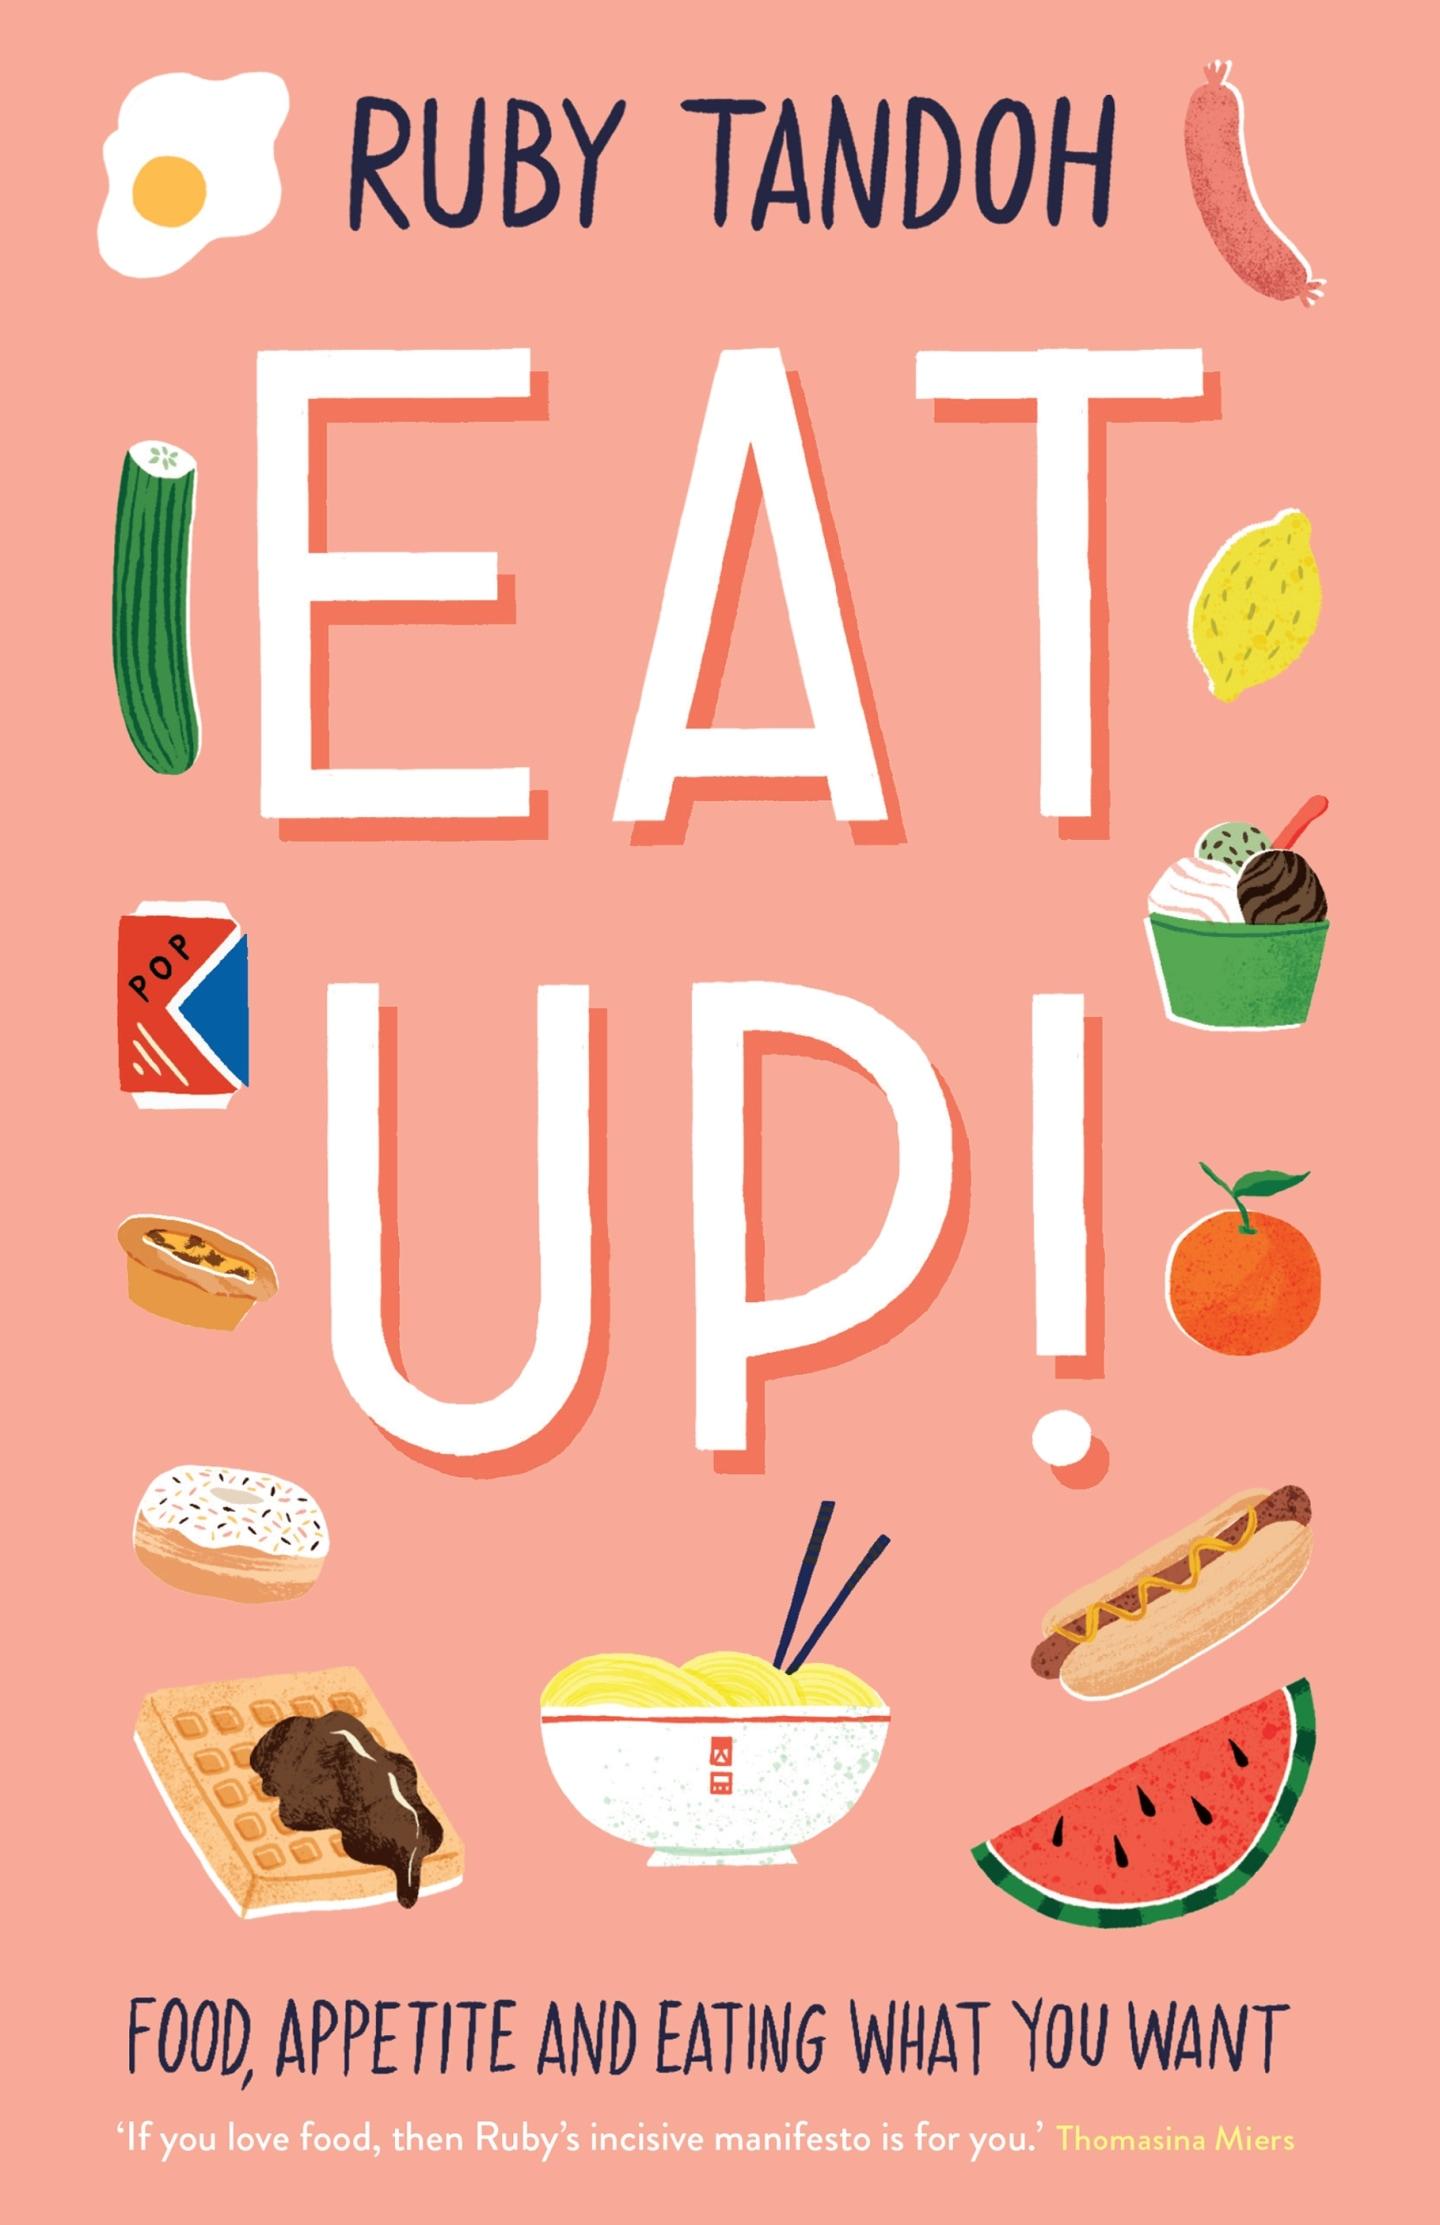 Ruby Tandoh's shame-free food manifesto is a revelation